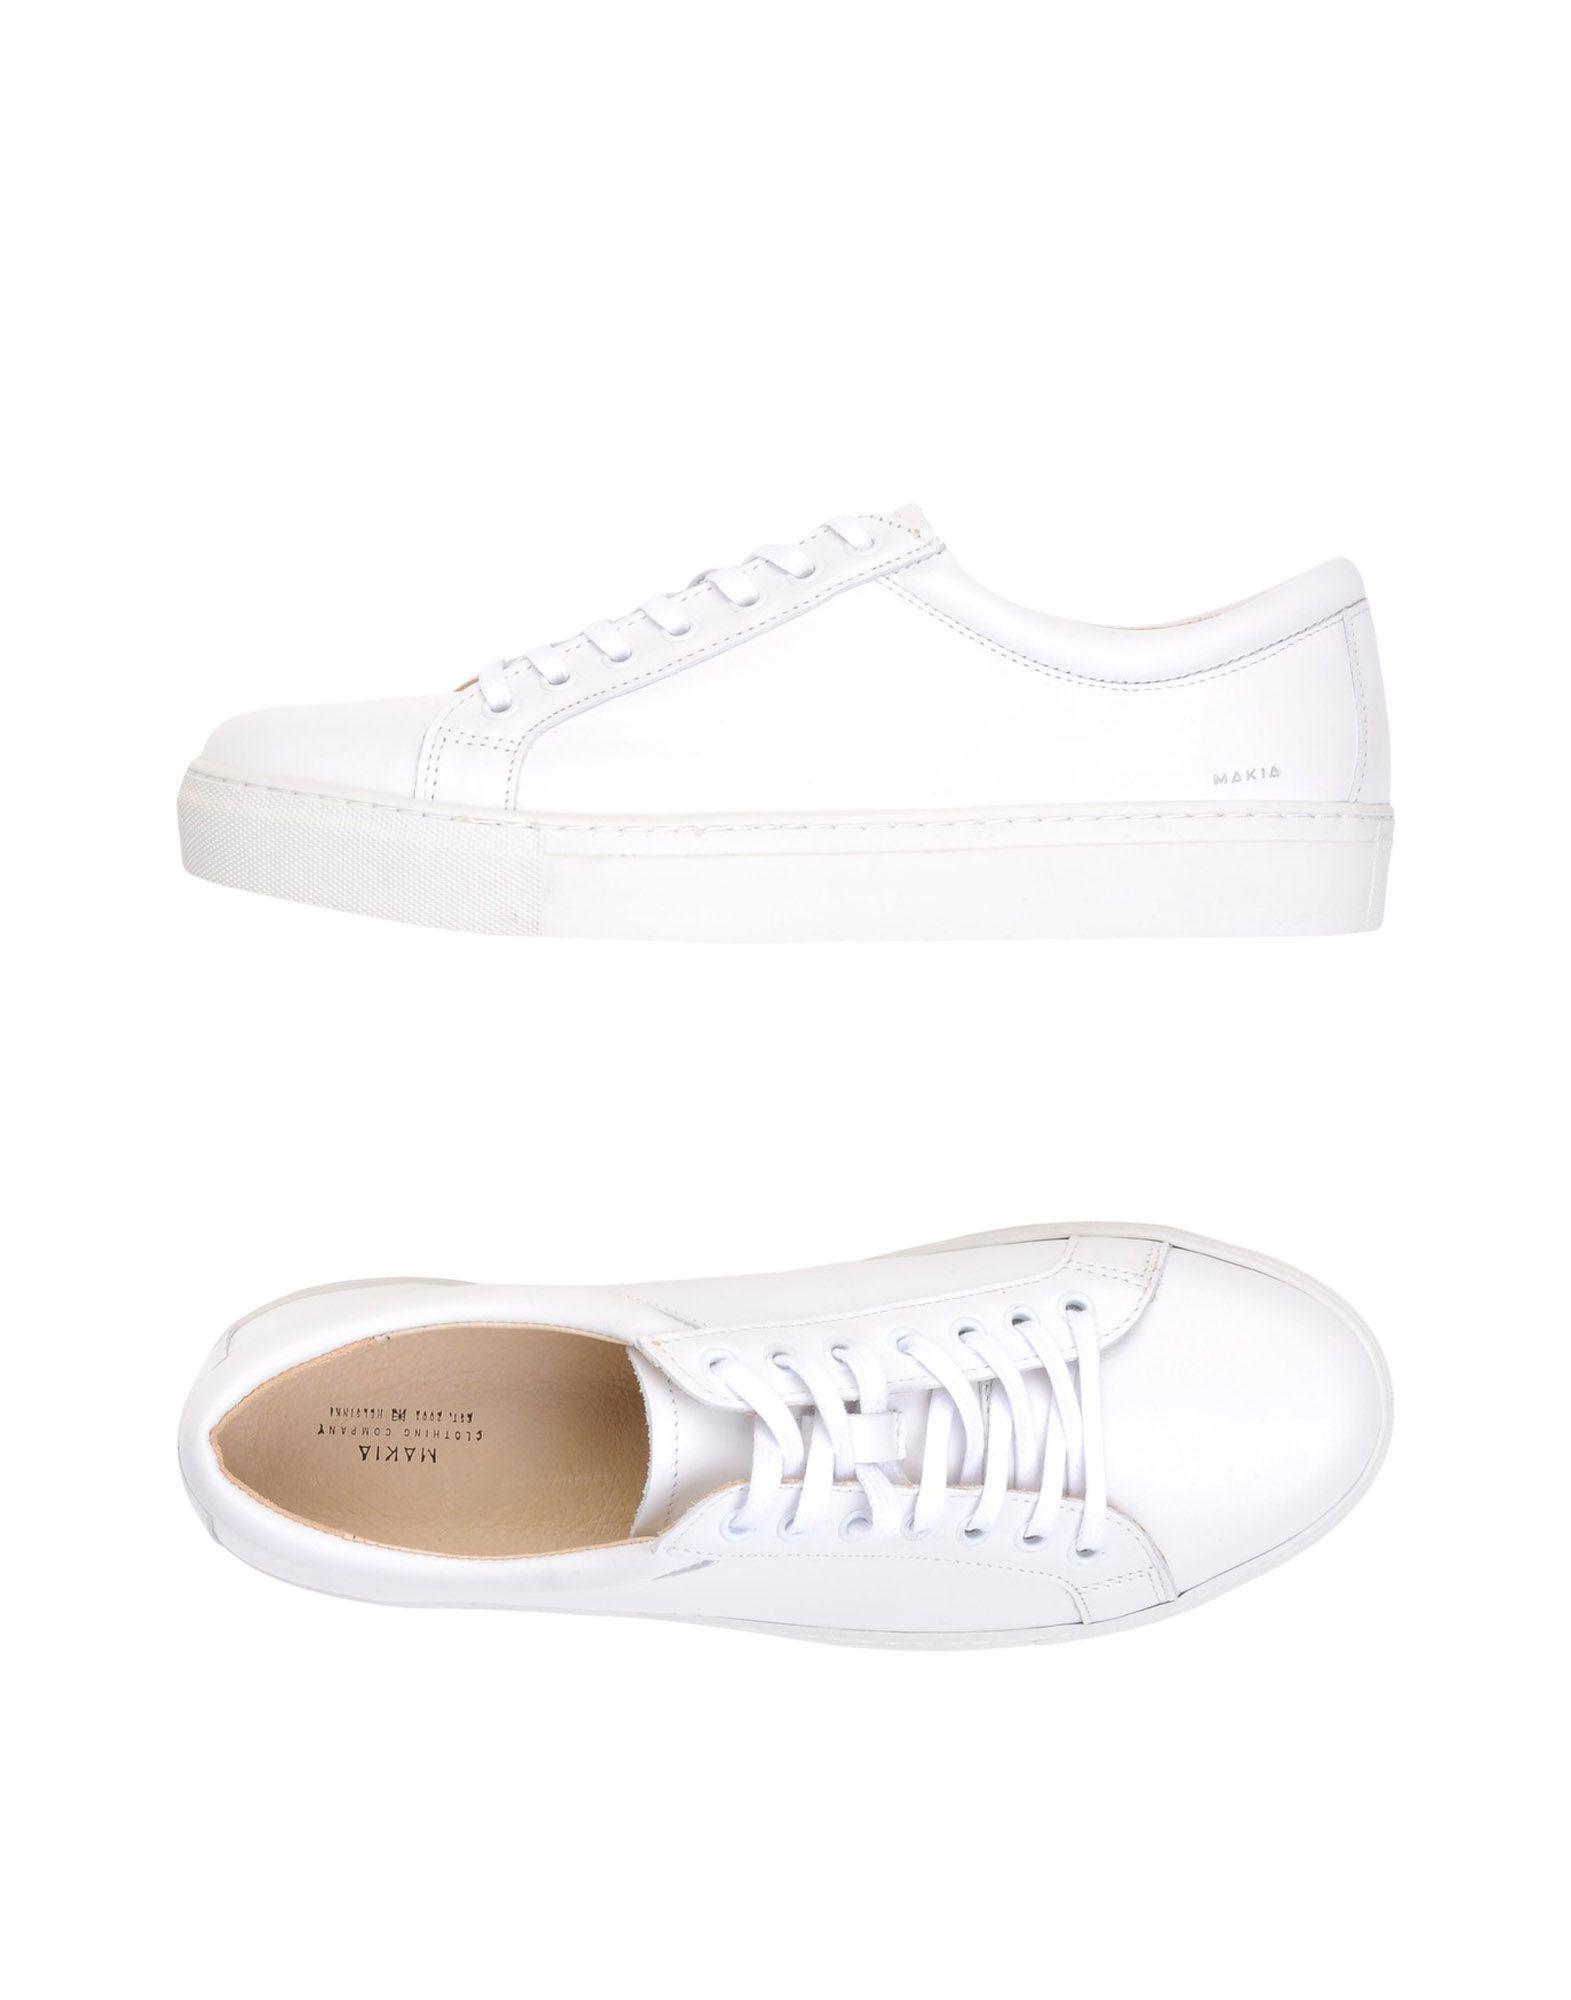 FOOTWEAR - Low-tops & sneakers on YOOX.COM Makia EnfcwlJdm